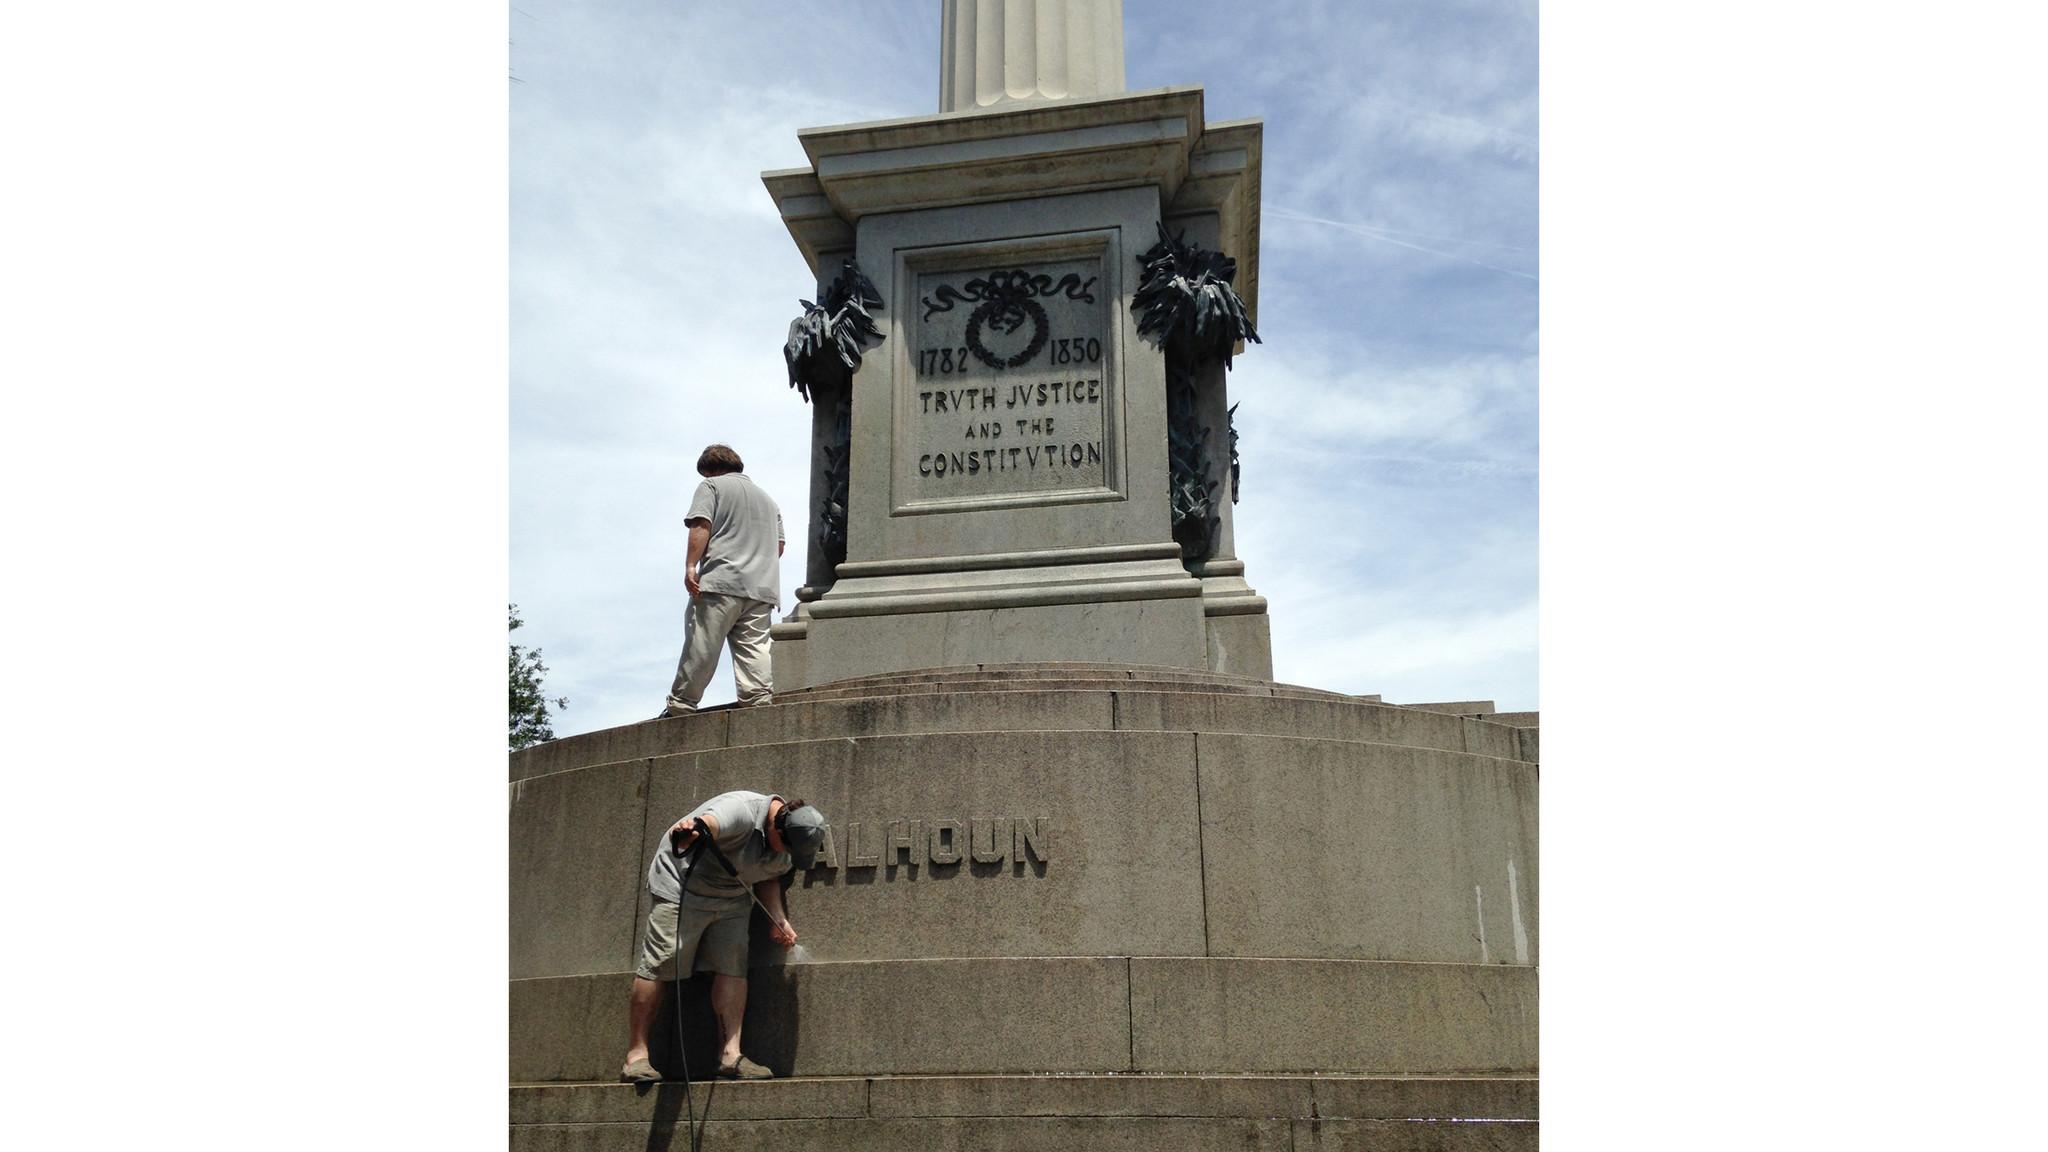 A June 23, 2015, file photo shows workmen removing graffiti from a statue of John C. Calhoun in Charleston, S.C.